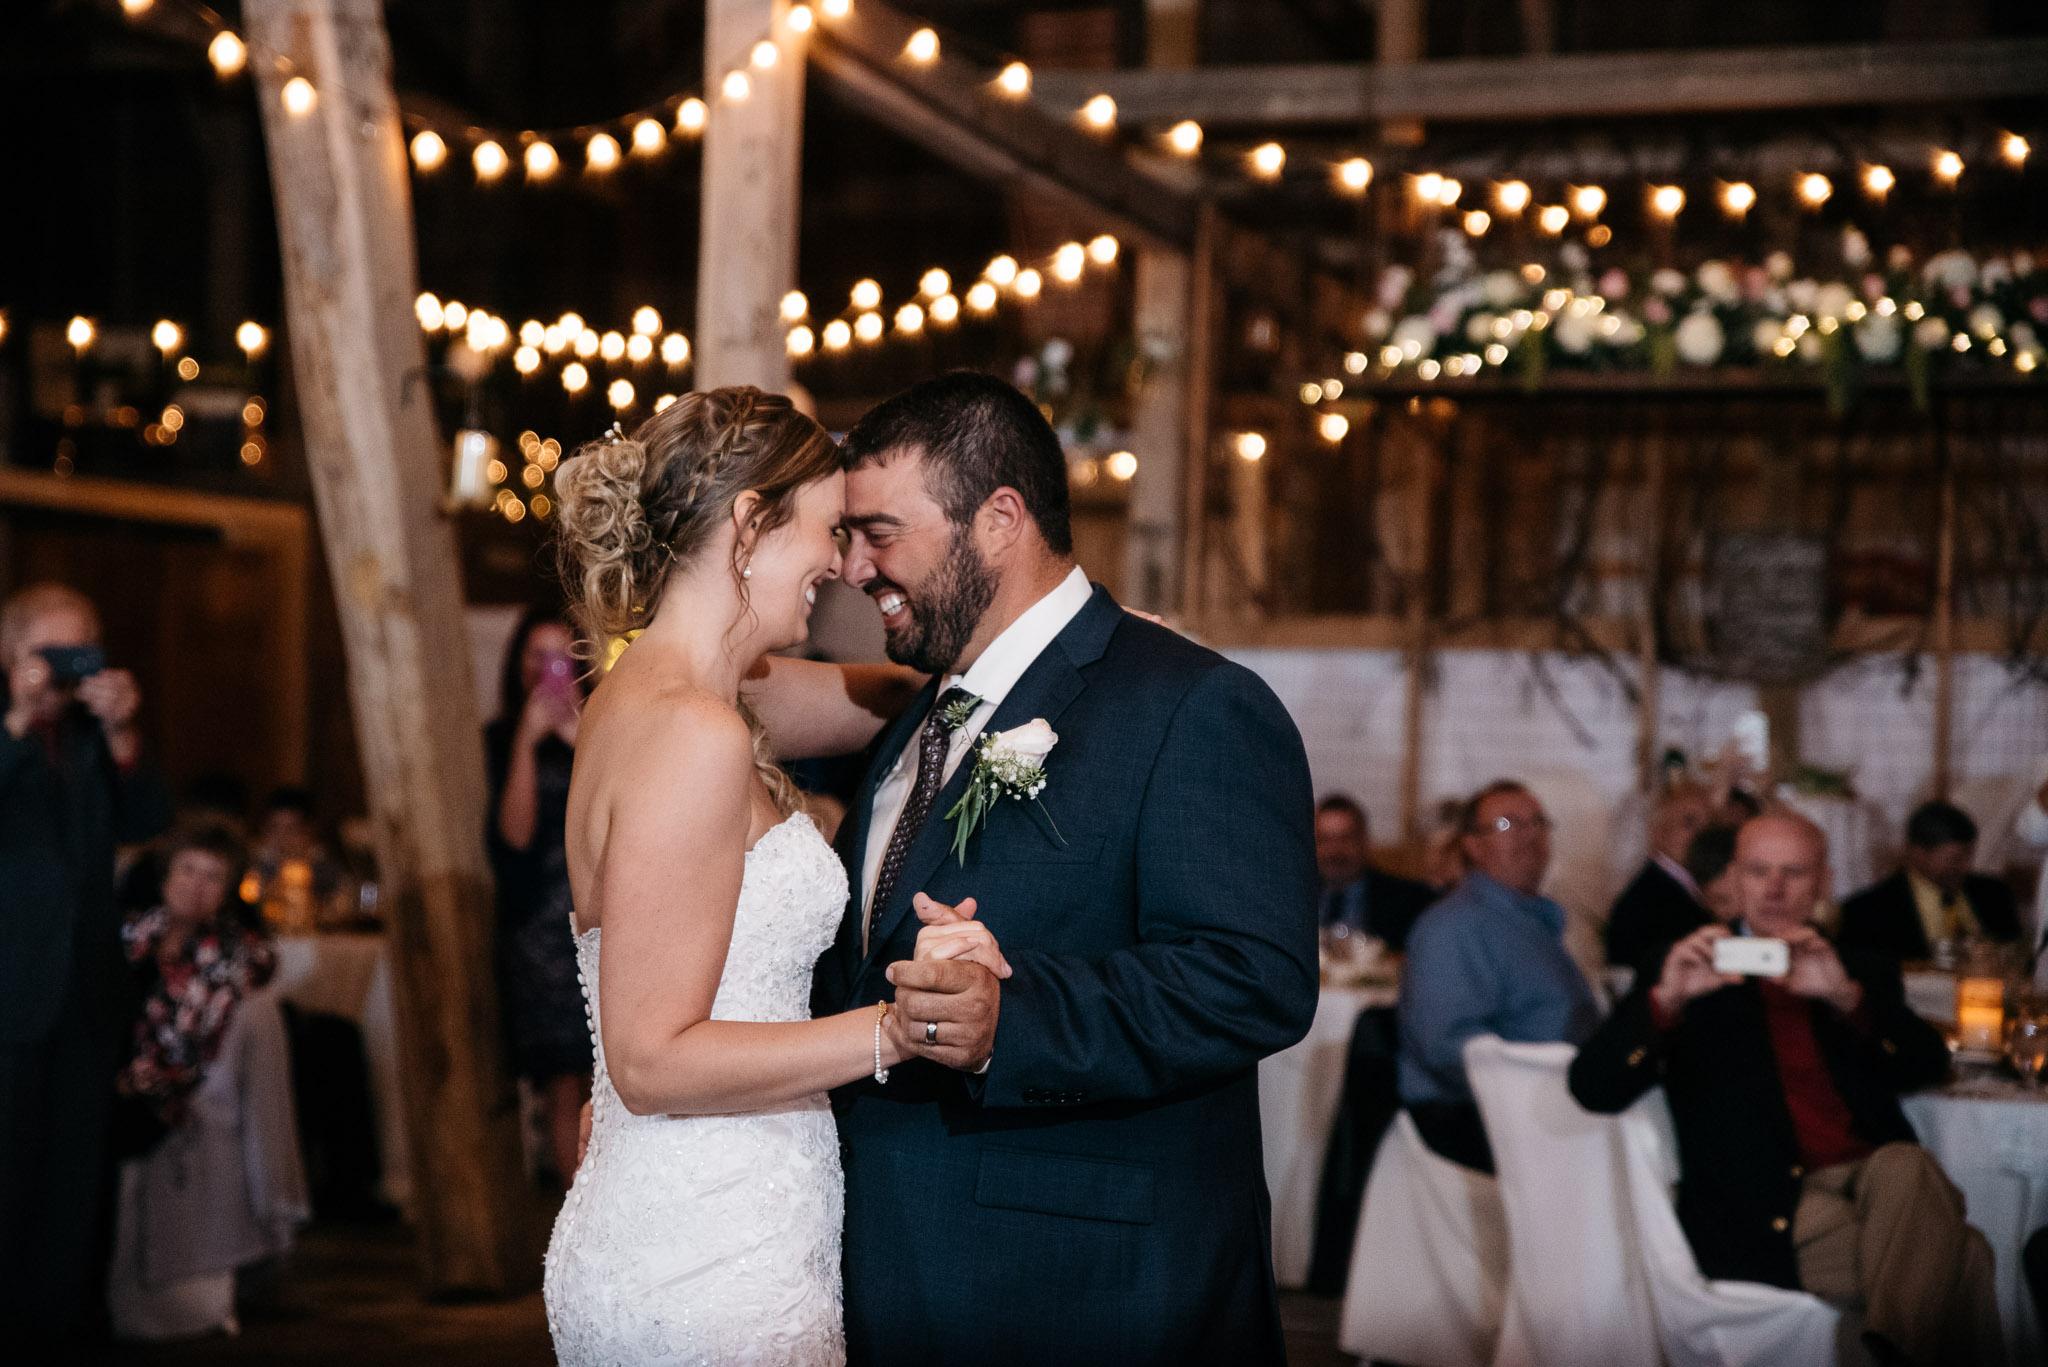 pittsburgh-ligonier-wedding-photographer-the-event-barn-at-highland-farms-4.jpg